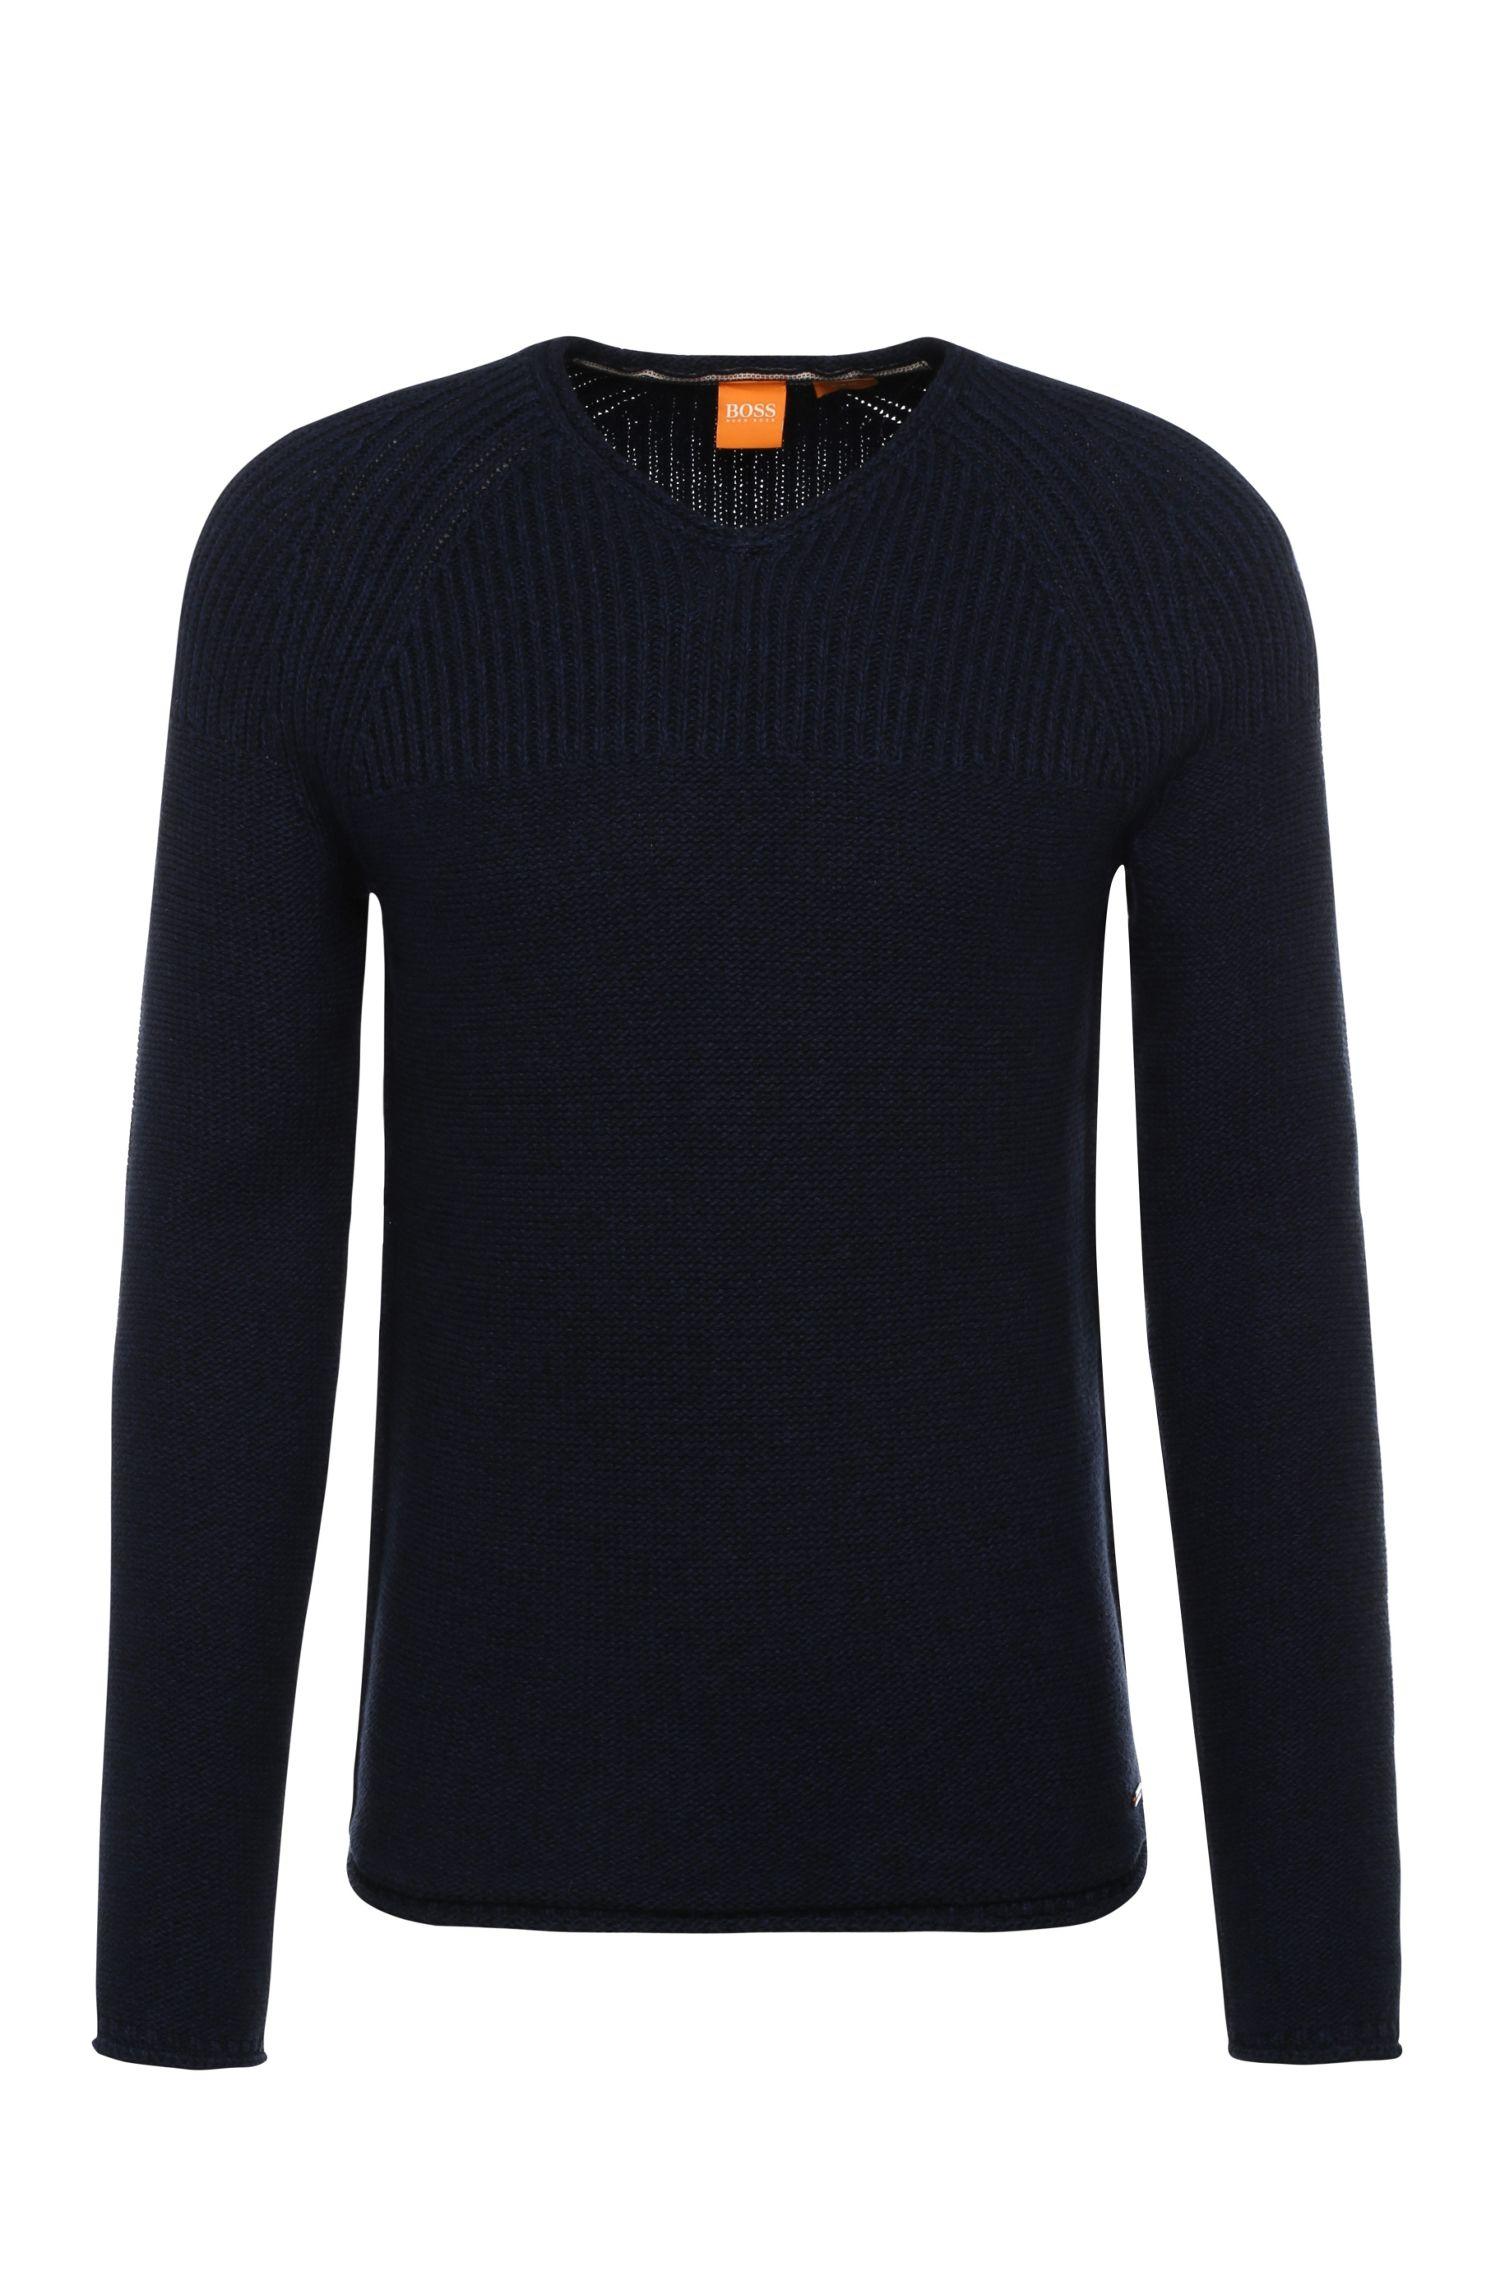 Narrow-cut sweater in cotton: 'Arkus'